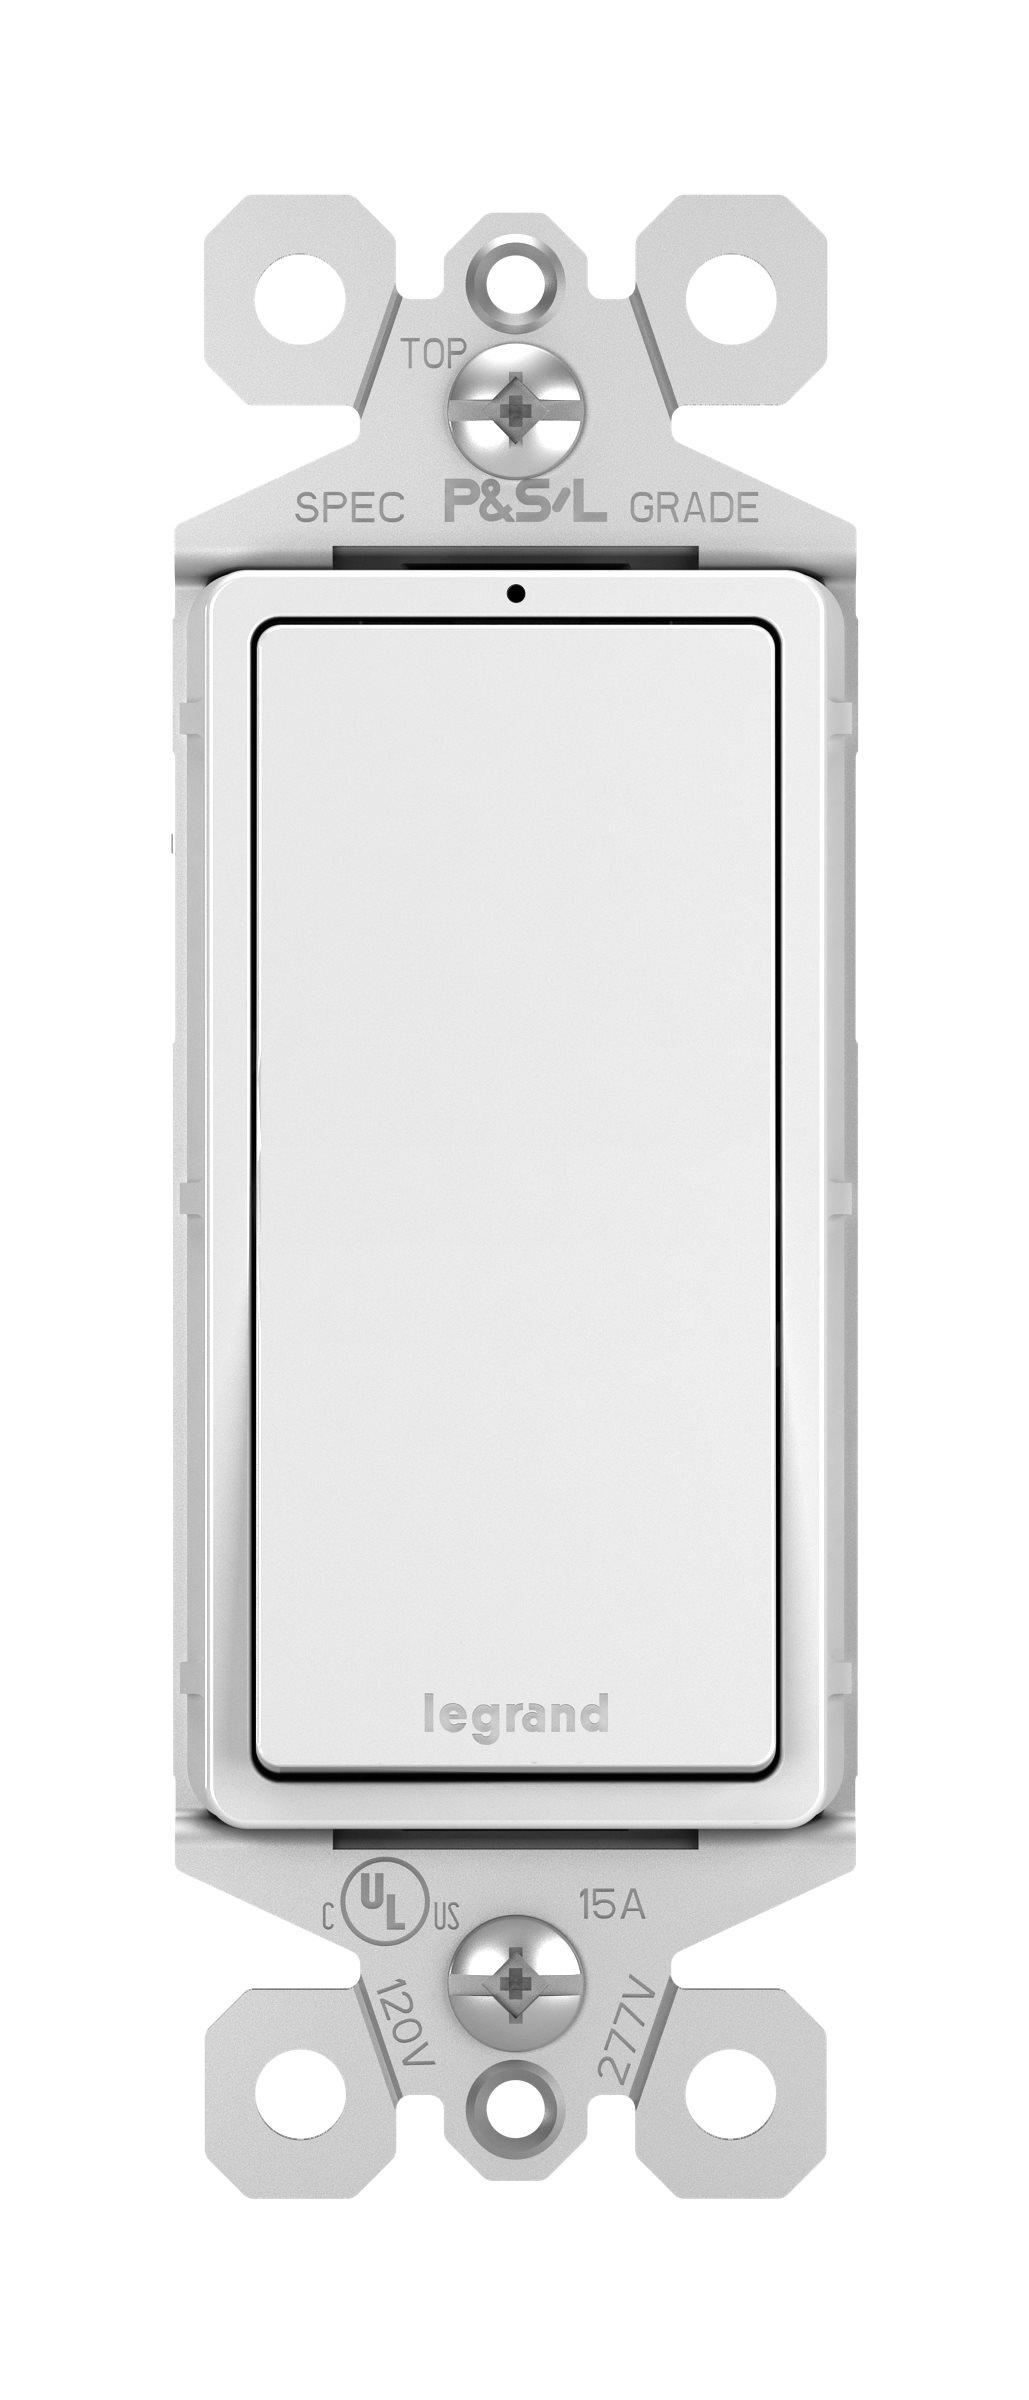 Legrand Radiant 3 Way Decorator Switch Lighted White 2